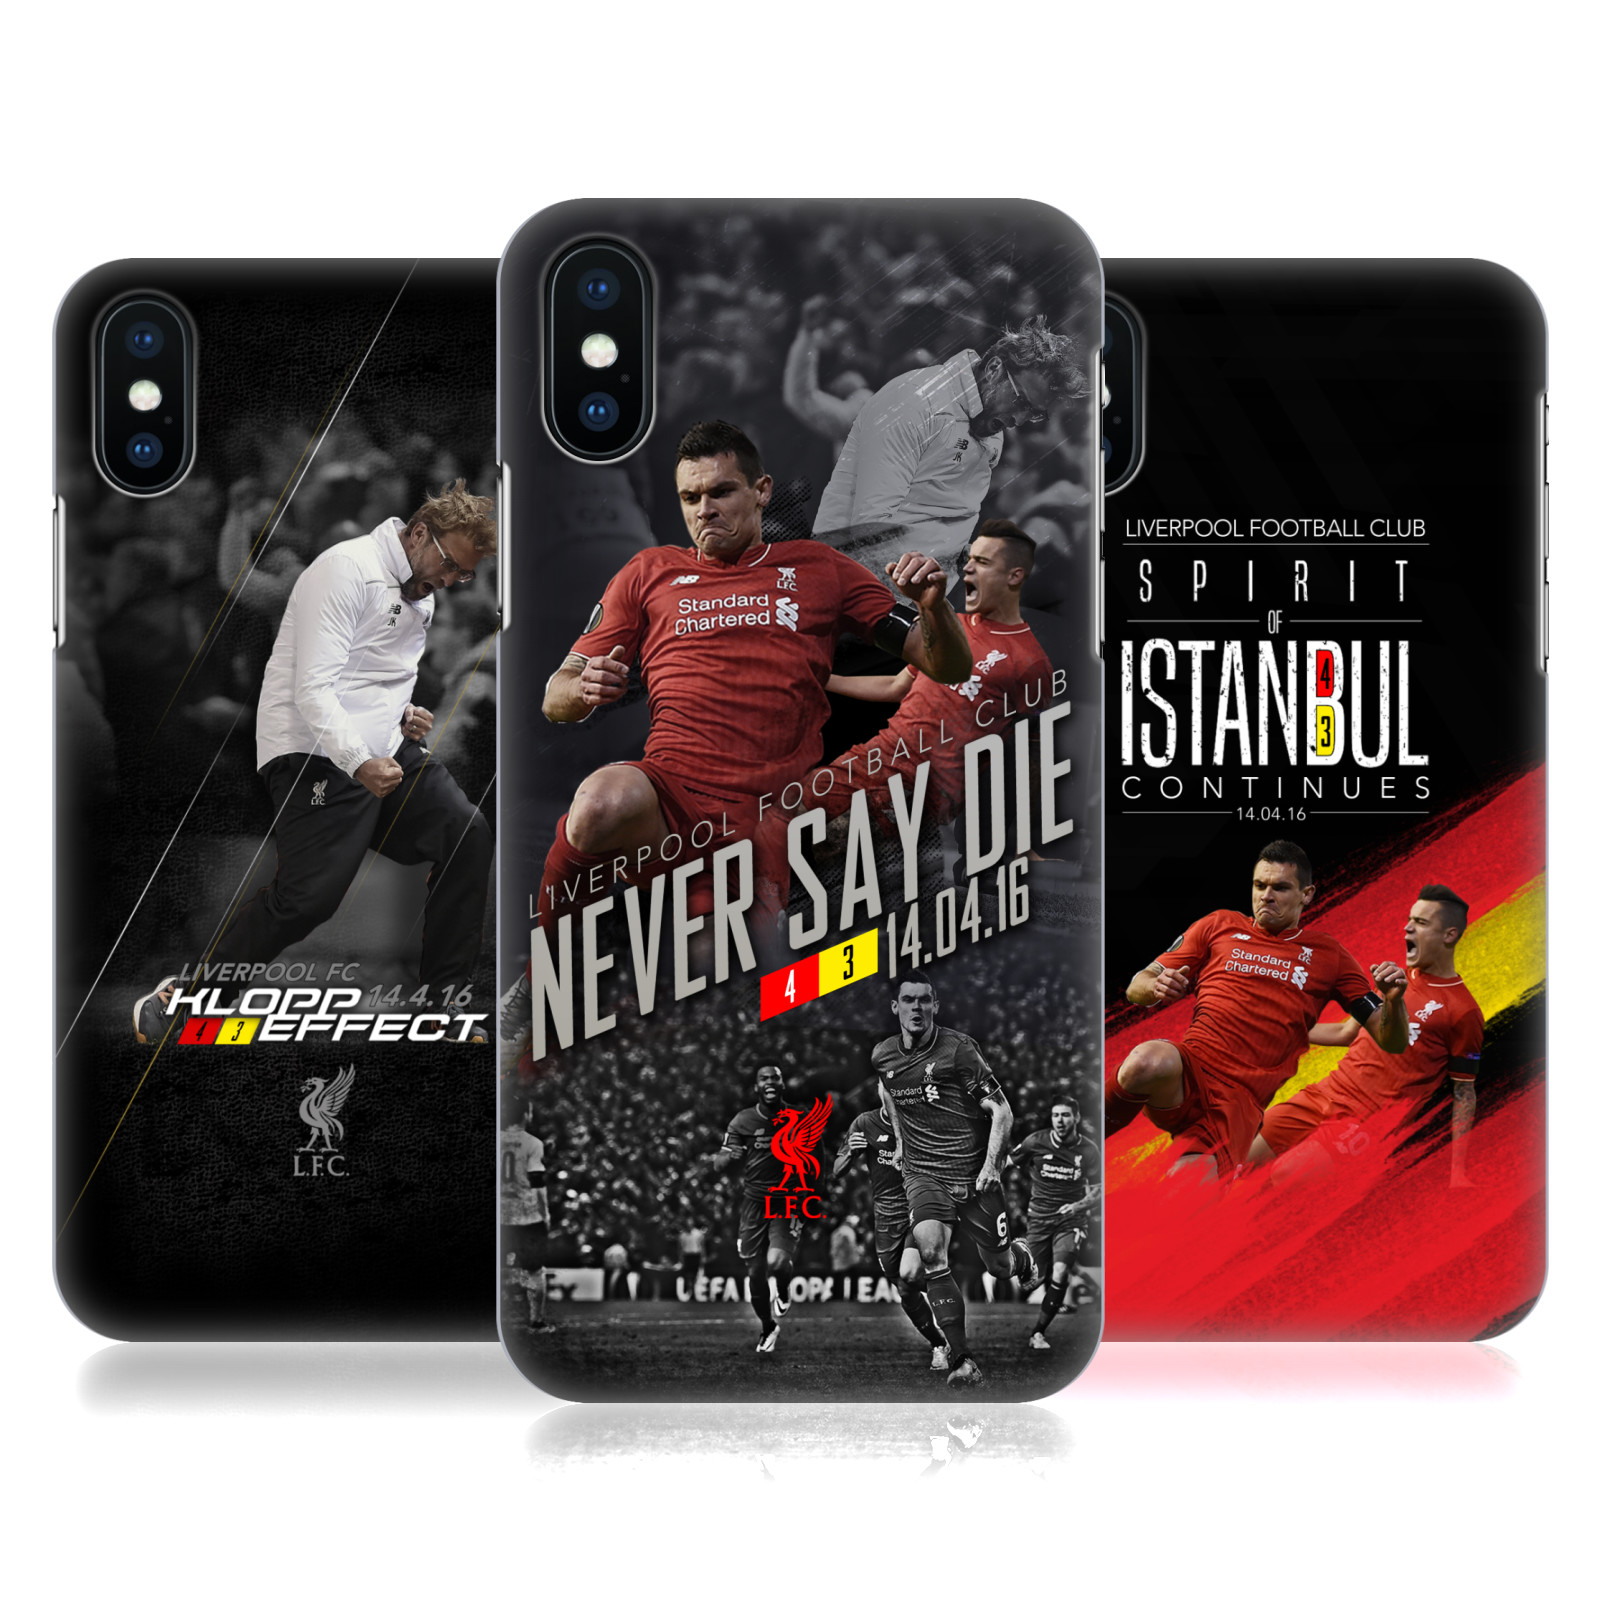 Liverpool Football Club Anfield Magic